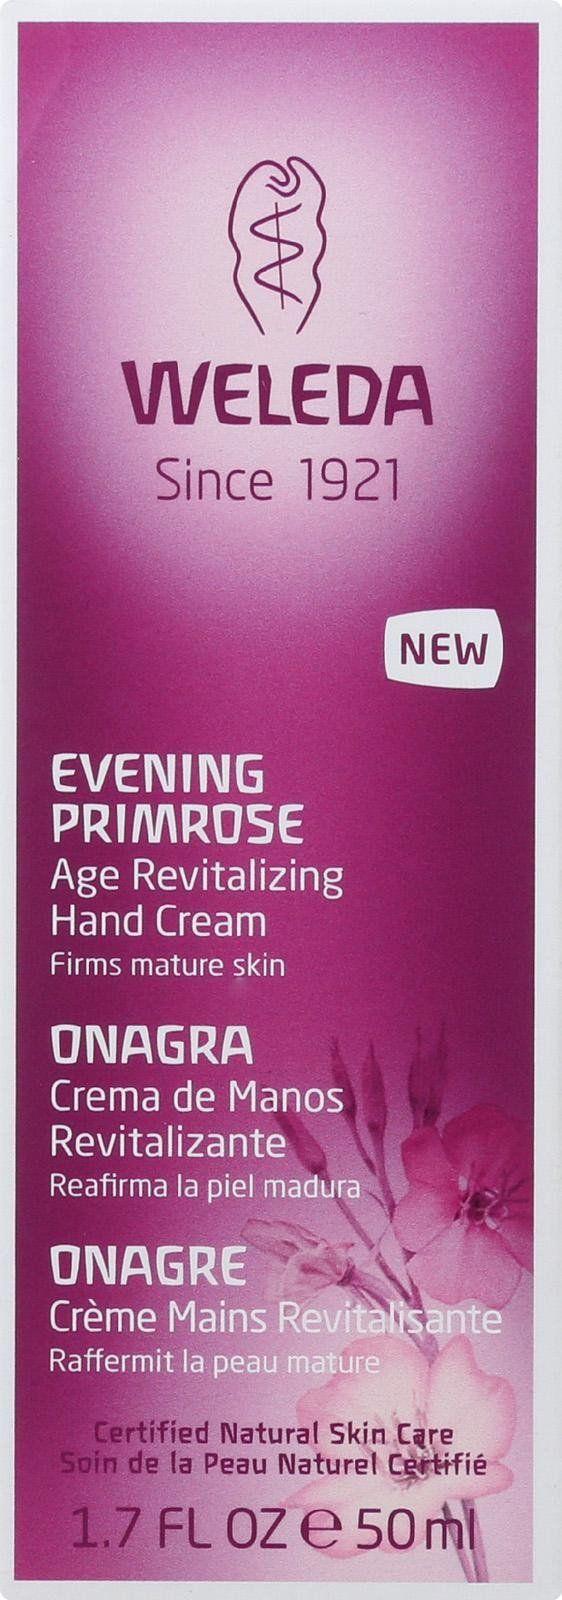 Weleda Hand Creme - Evening Primrose Age Revitalizing - 1.7 Oz